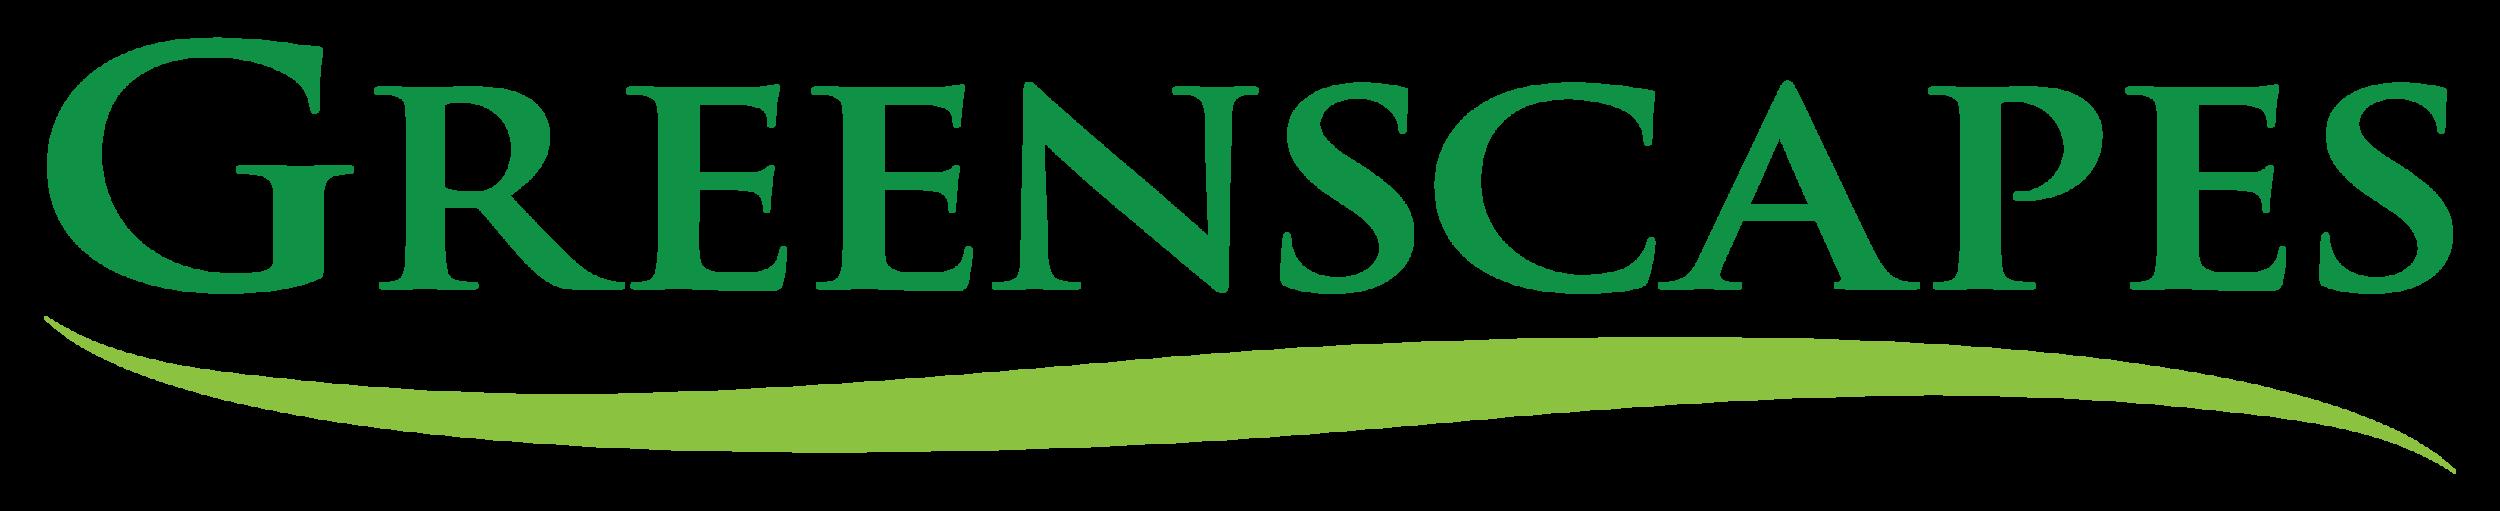 Greenscapes-Logo-2017.png